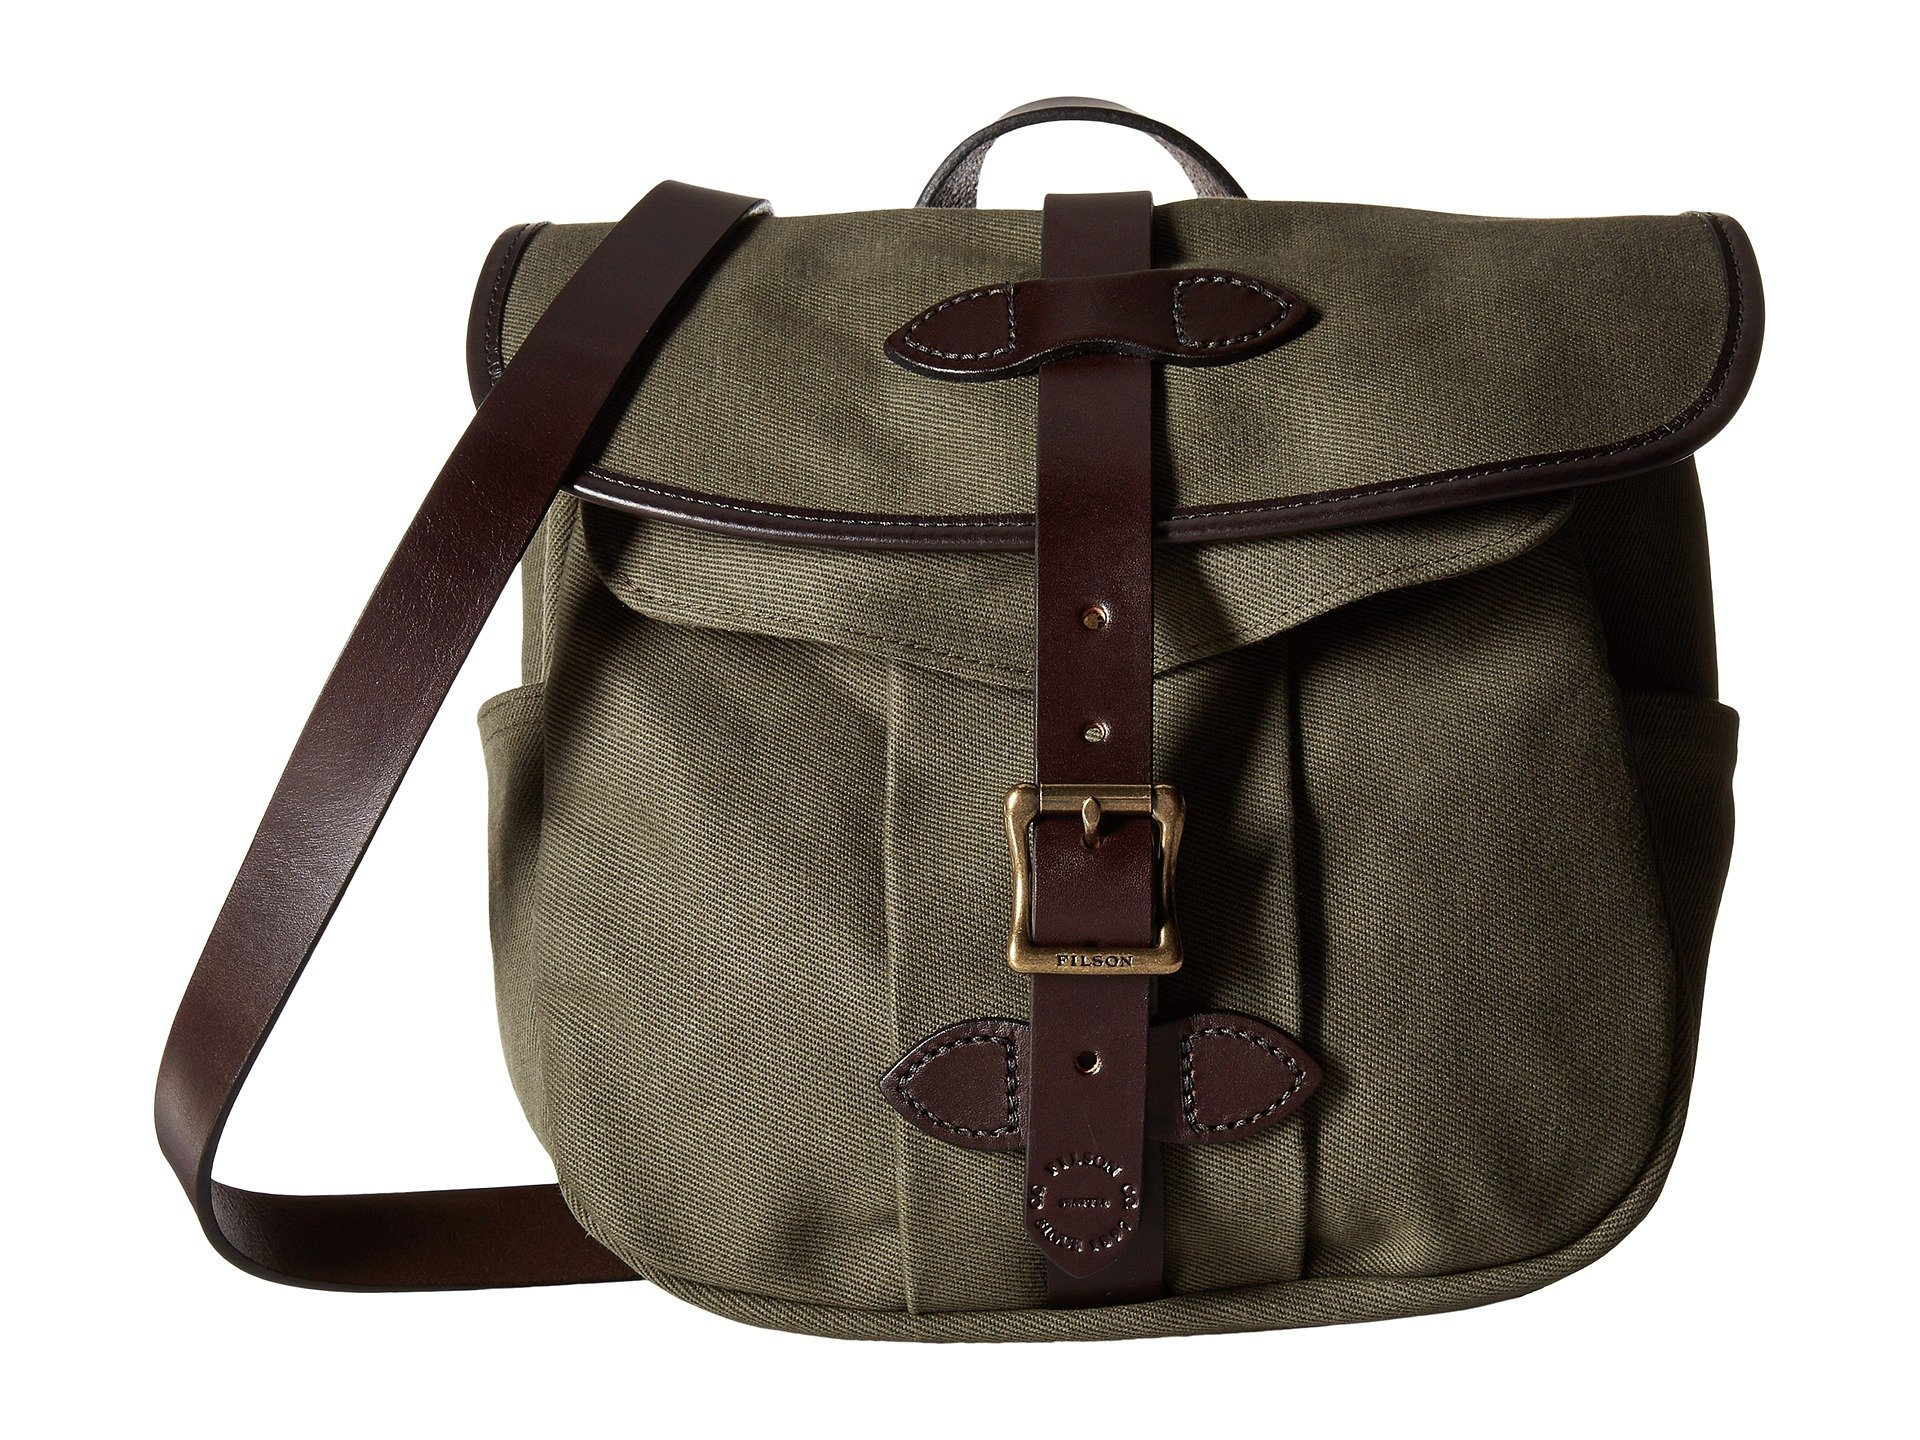 Filson Unisex Small Field Bag Otter Green 2 One Size